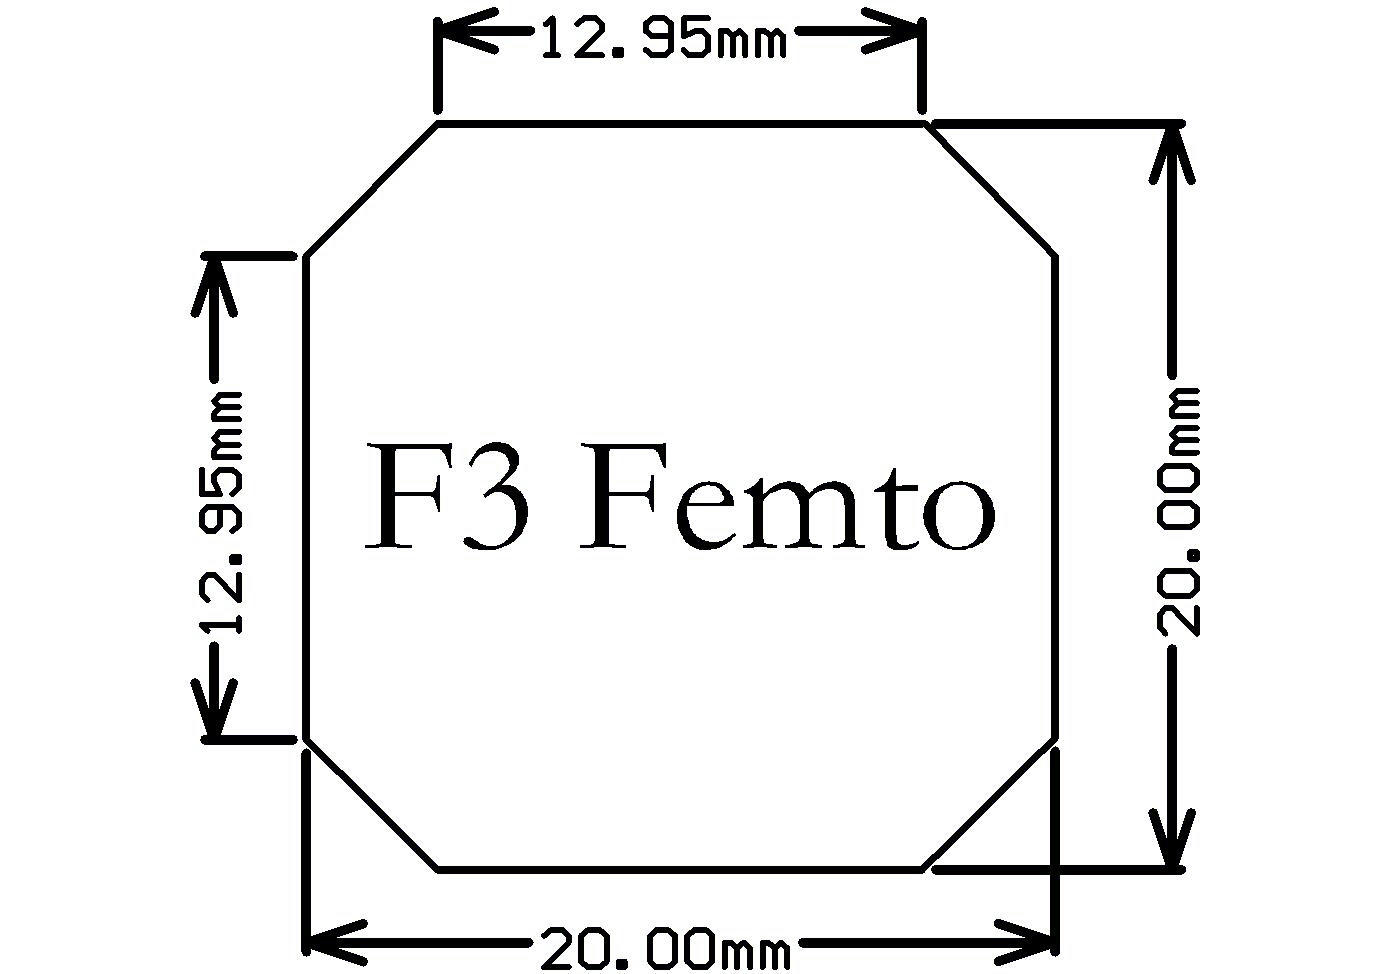 f3-femto-dimensions.jpg